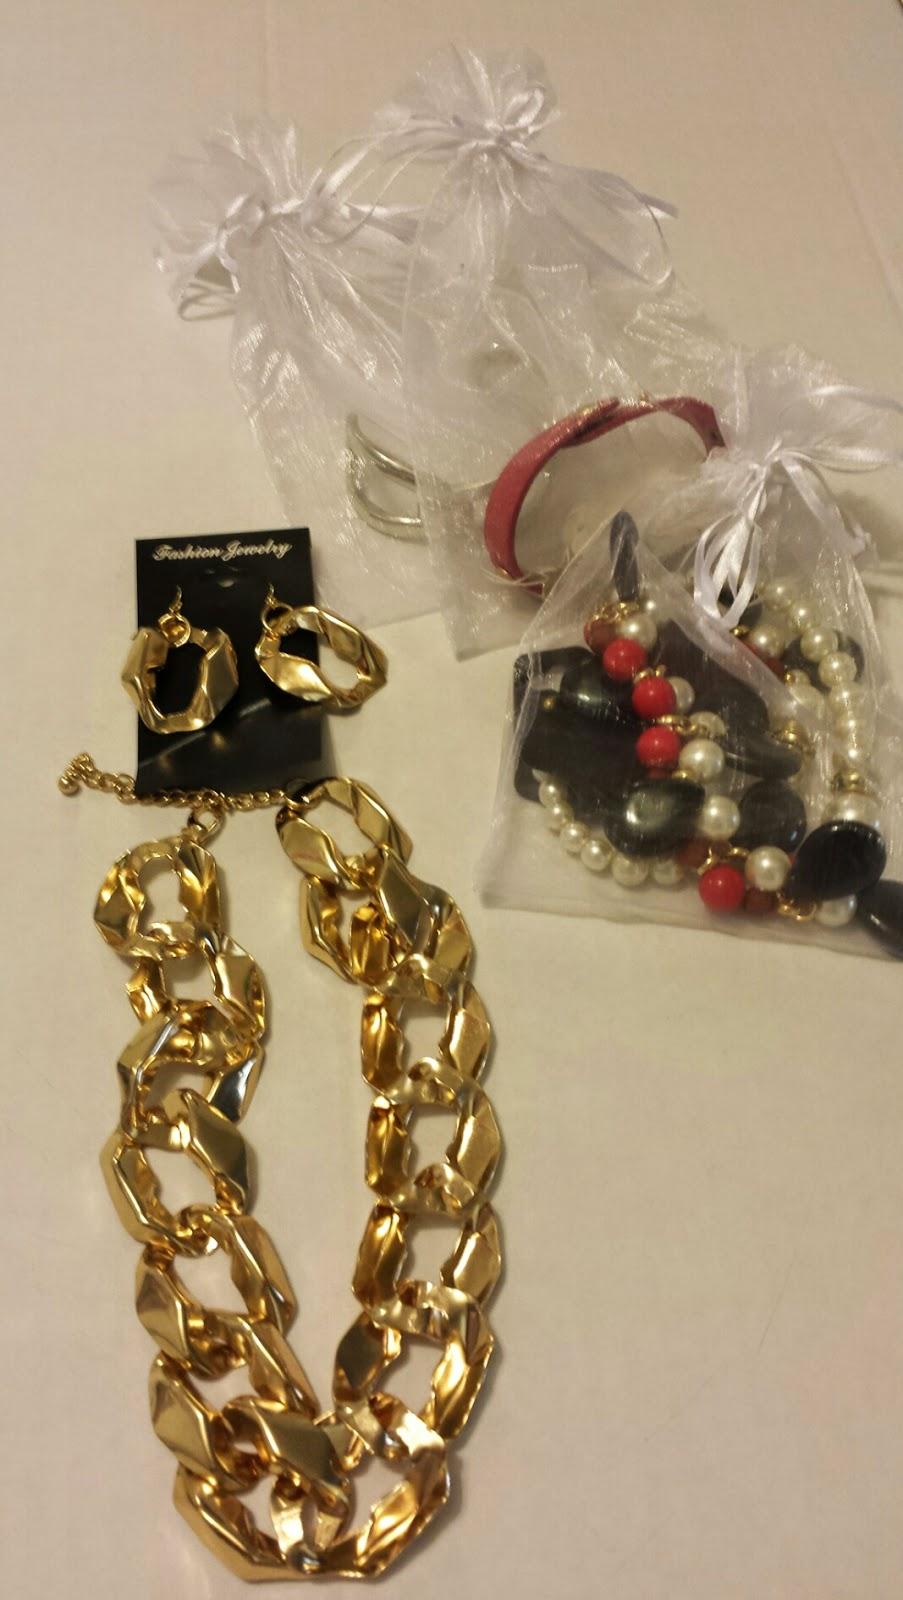 Rhianna's Studio and Love My Accessories Jewelry Display